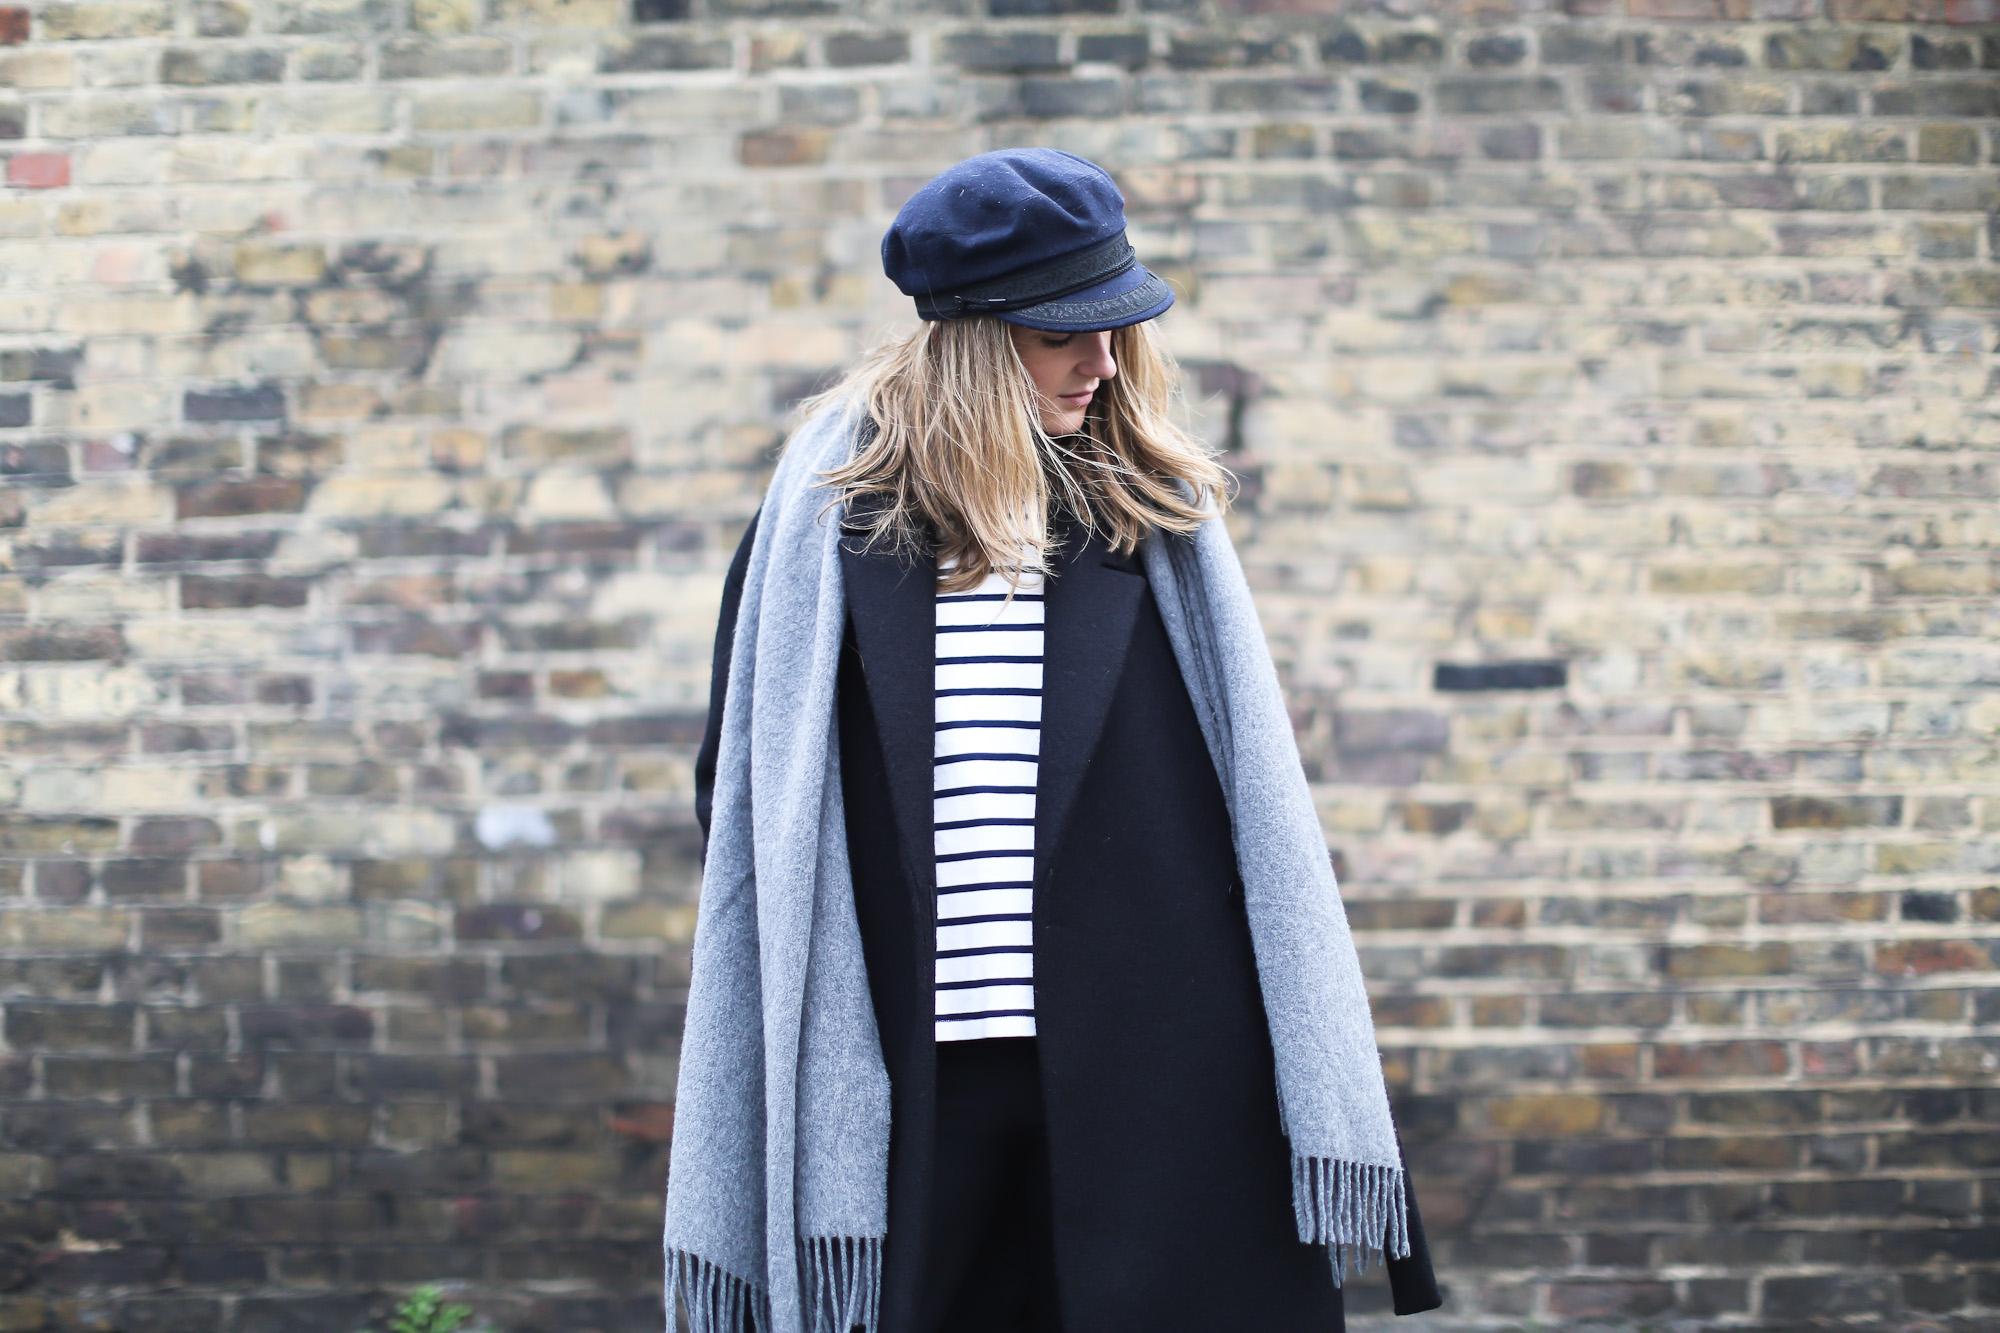 Clochet_streetstyle_london_cos_long_woo_coat_saint_james_mariniere_cup_celine_trio_bag-9